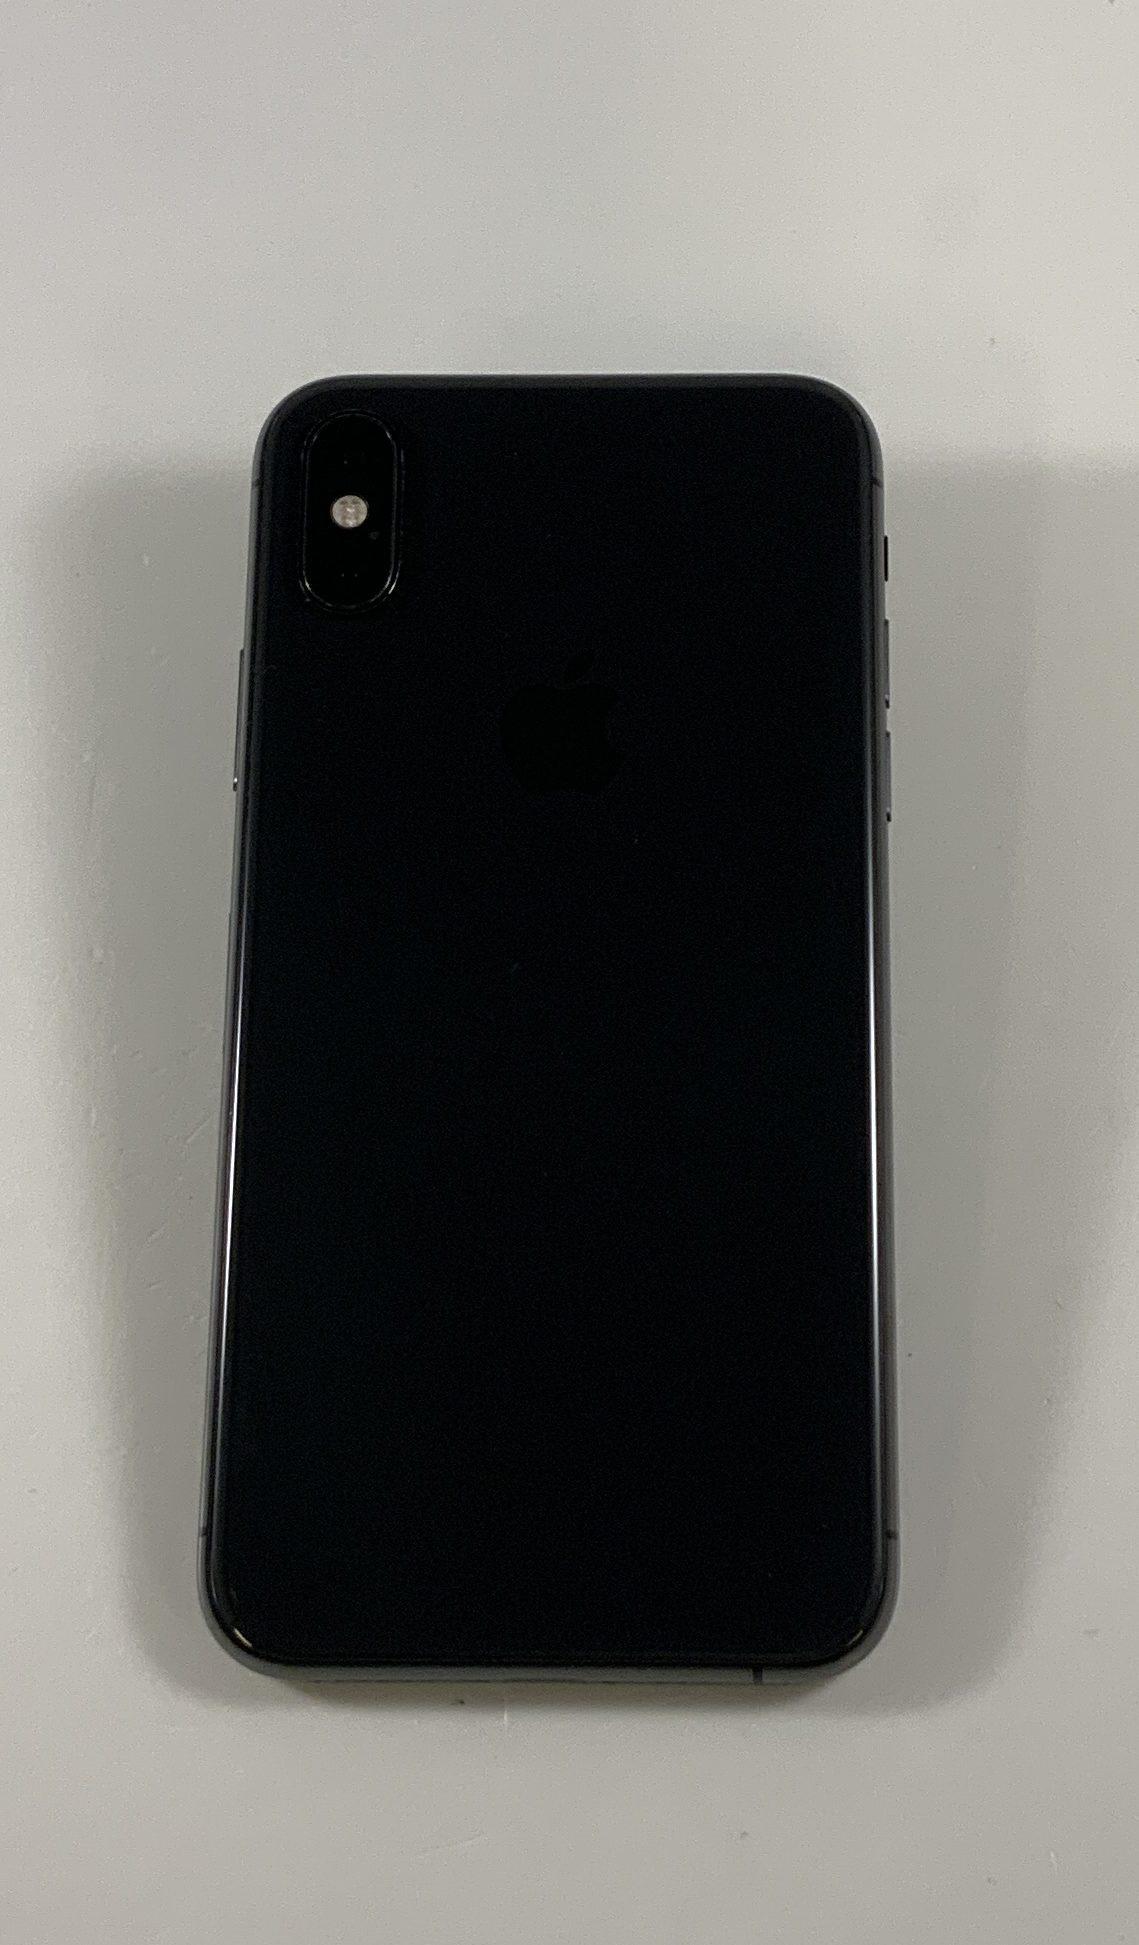 iPhone XS 64GB, 64GB, Space Gray, Afbeelding 2